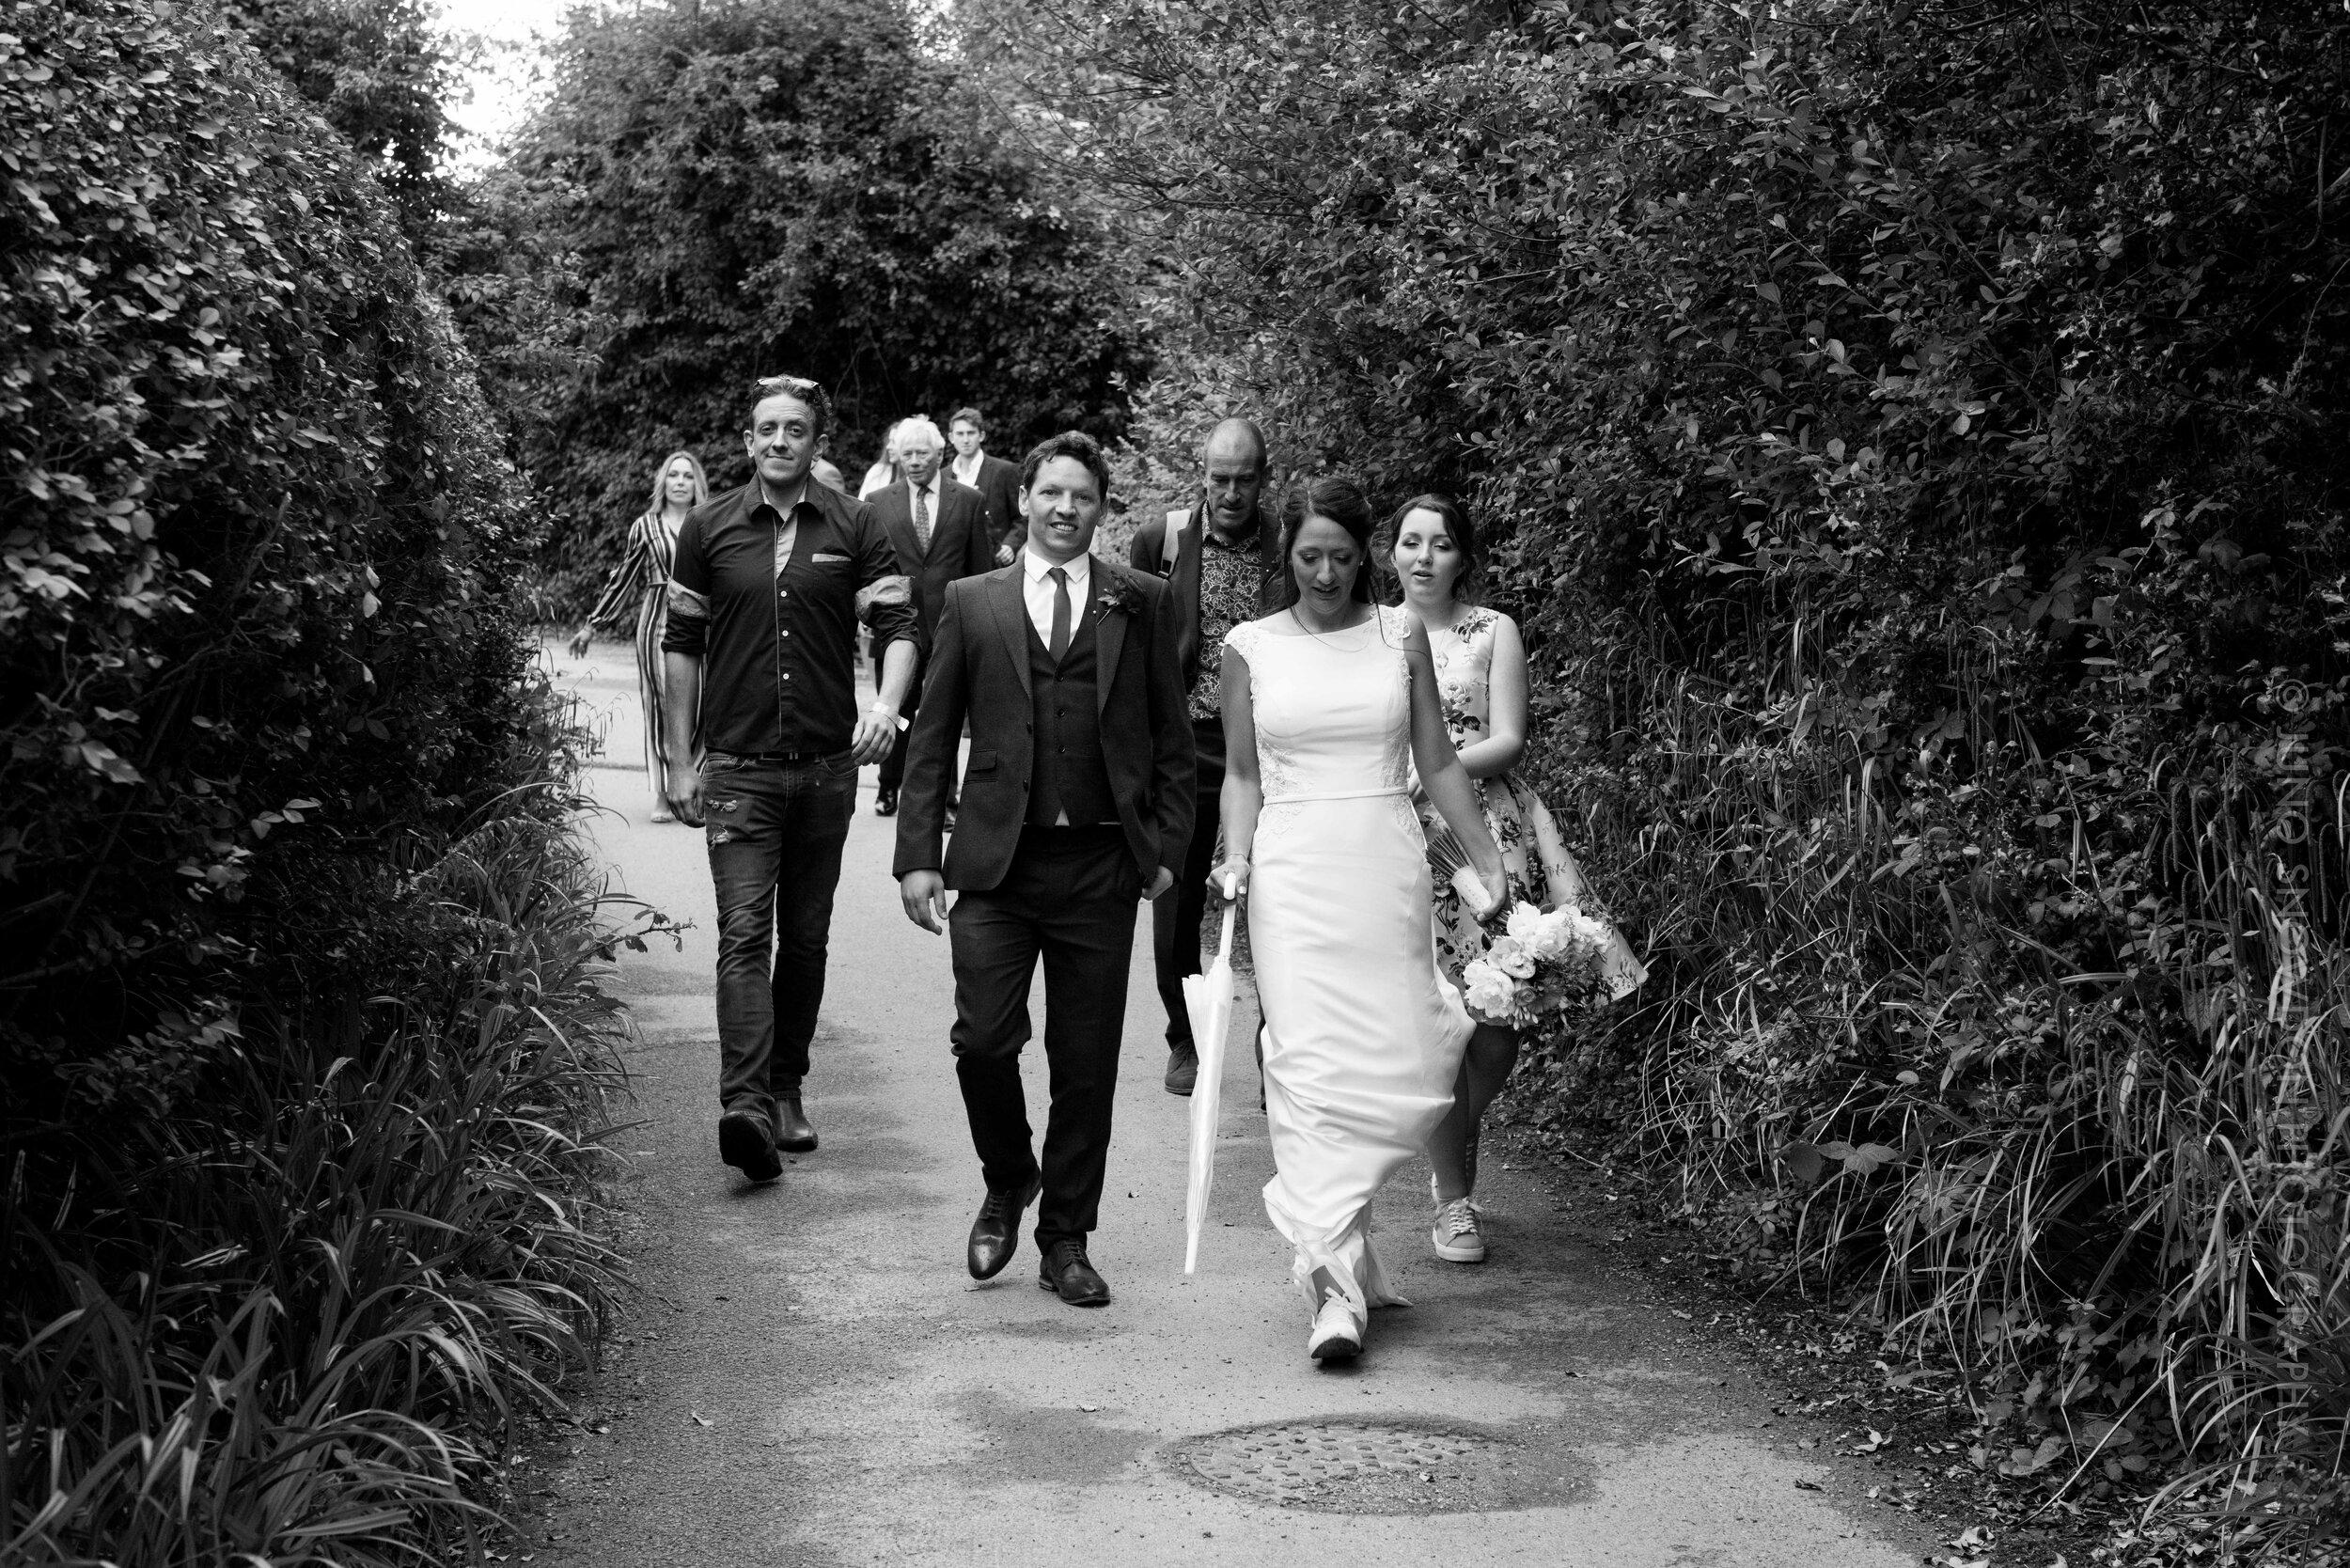 juno-snowdon-photography-wedding-7890.jpg